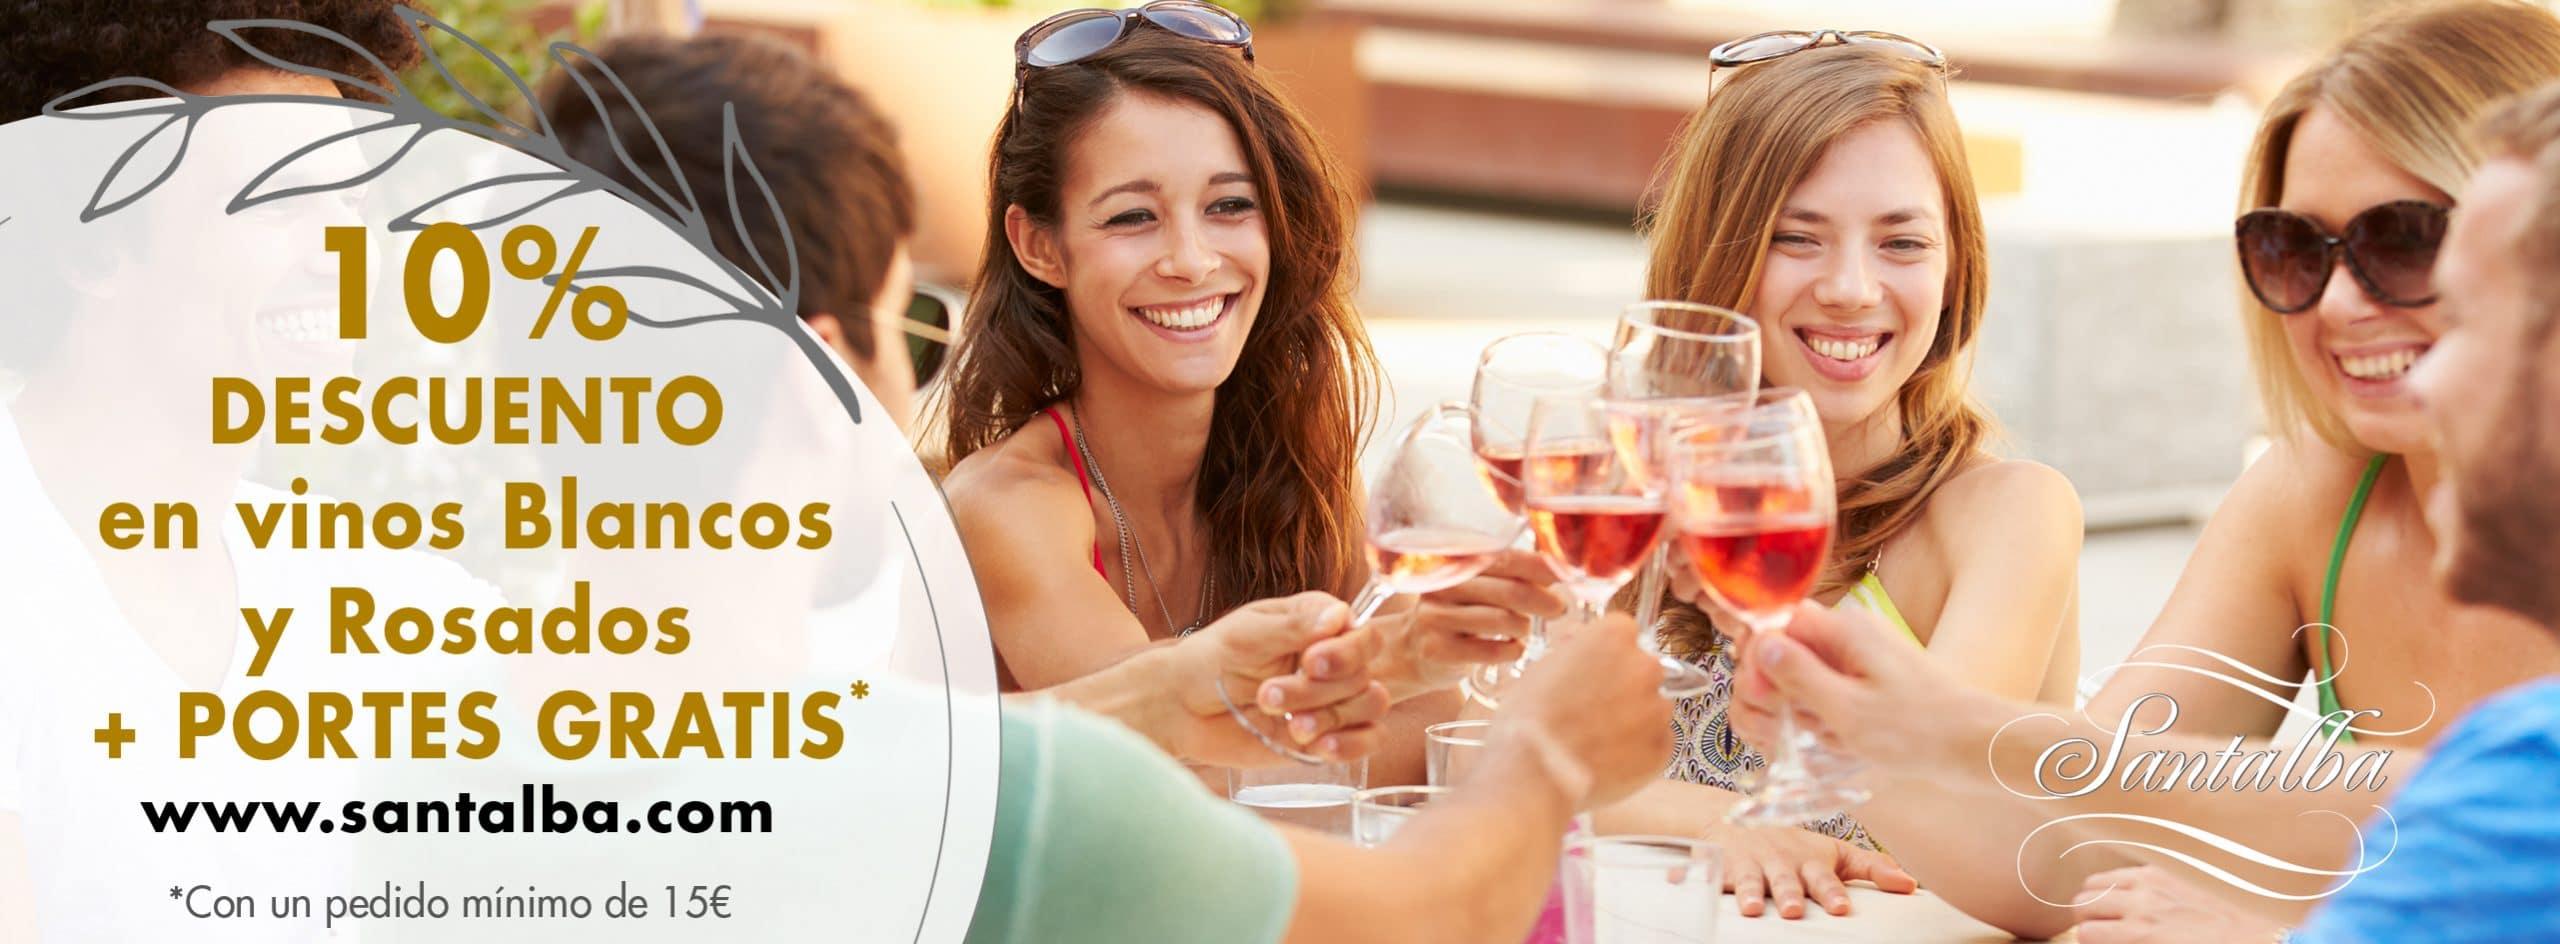 Compra Vinos Rioja Santalba